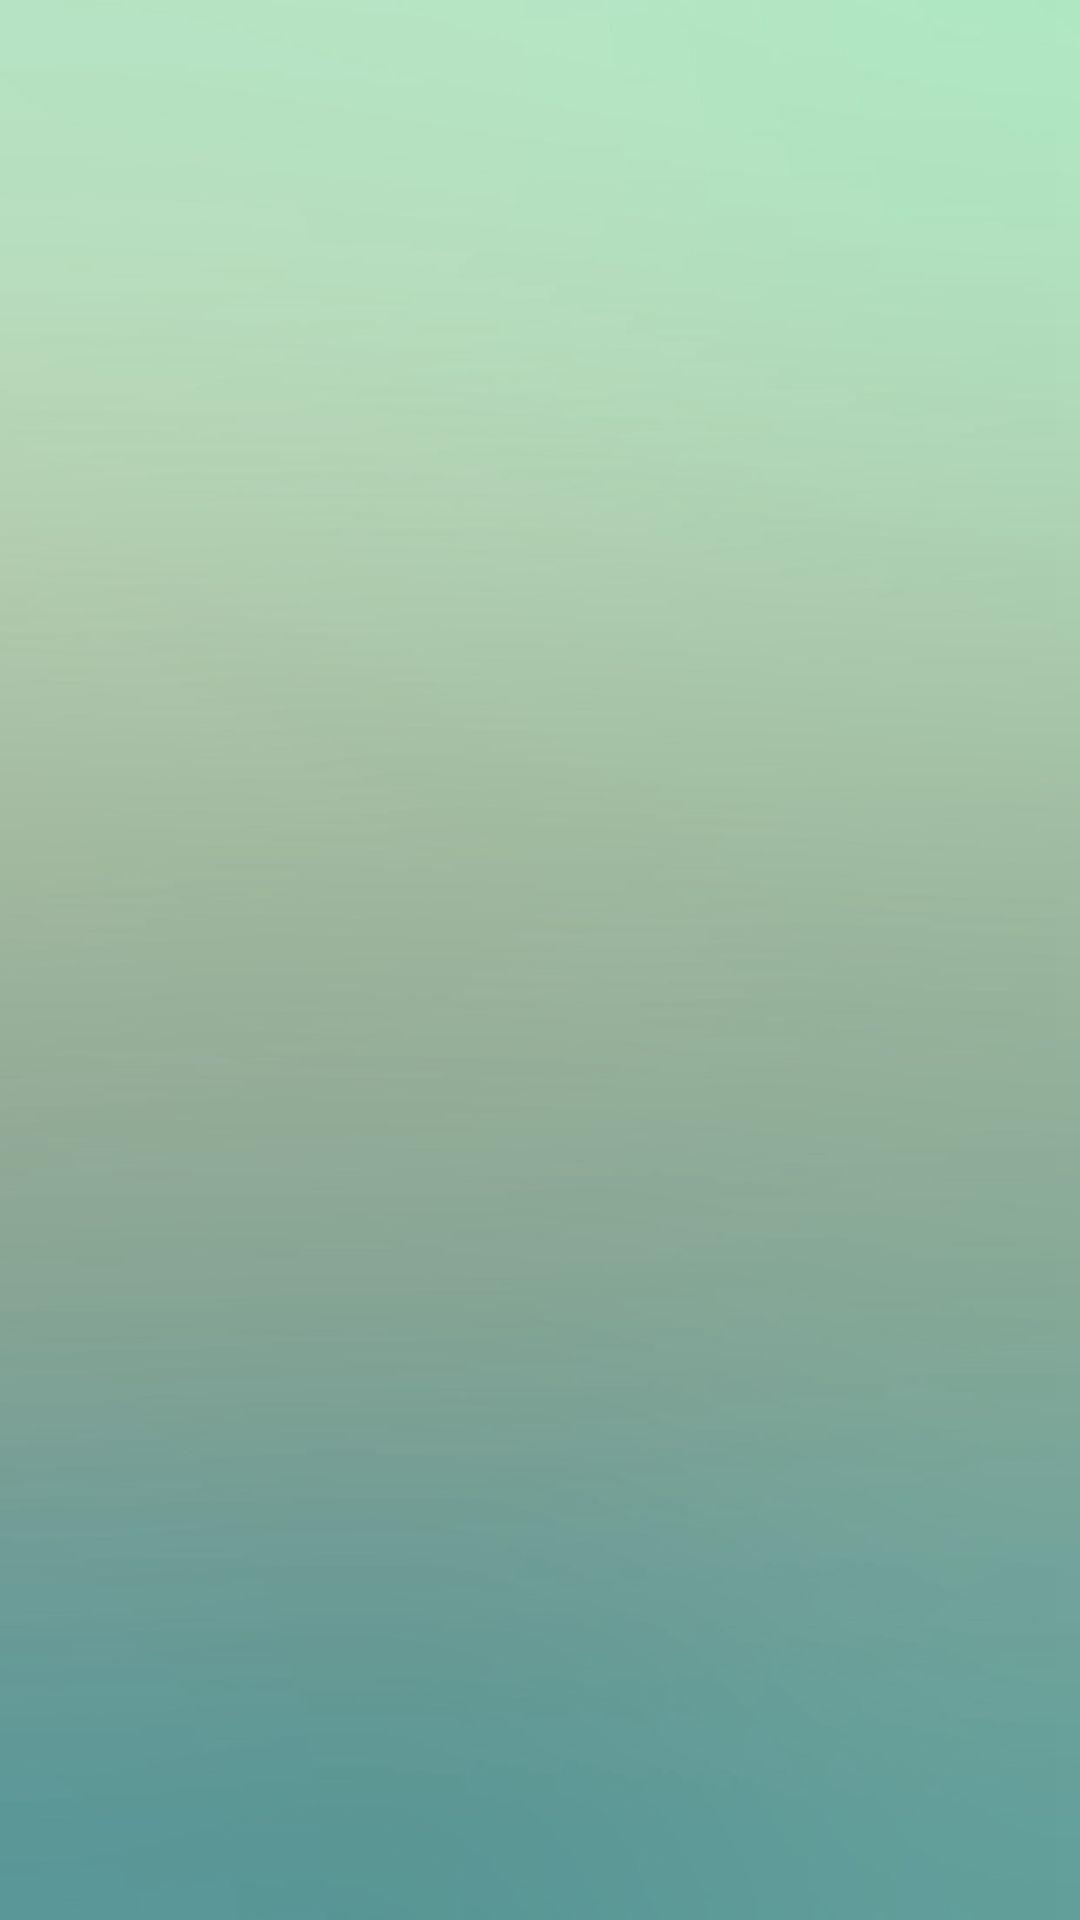 Wallpaper iphone soft - Soft Air Morning Sky Gradation Blur Blue Iphone 6 Plus Wallpaper